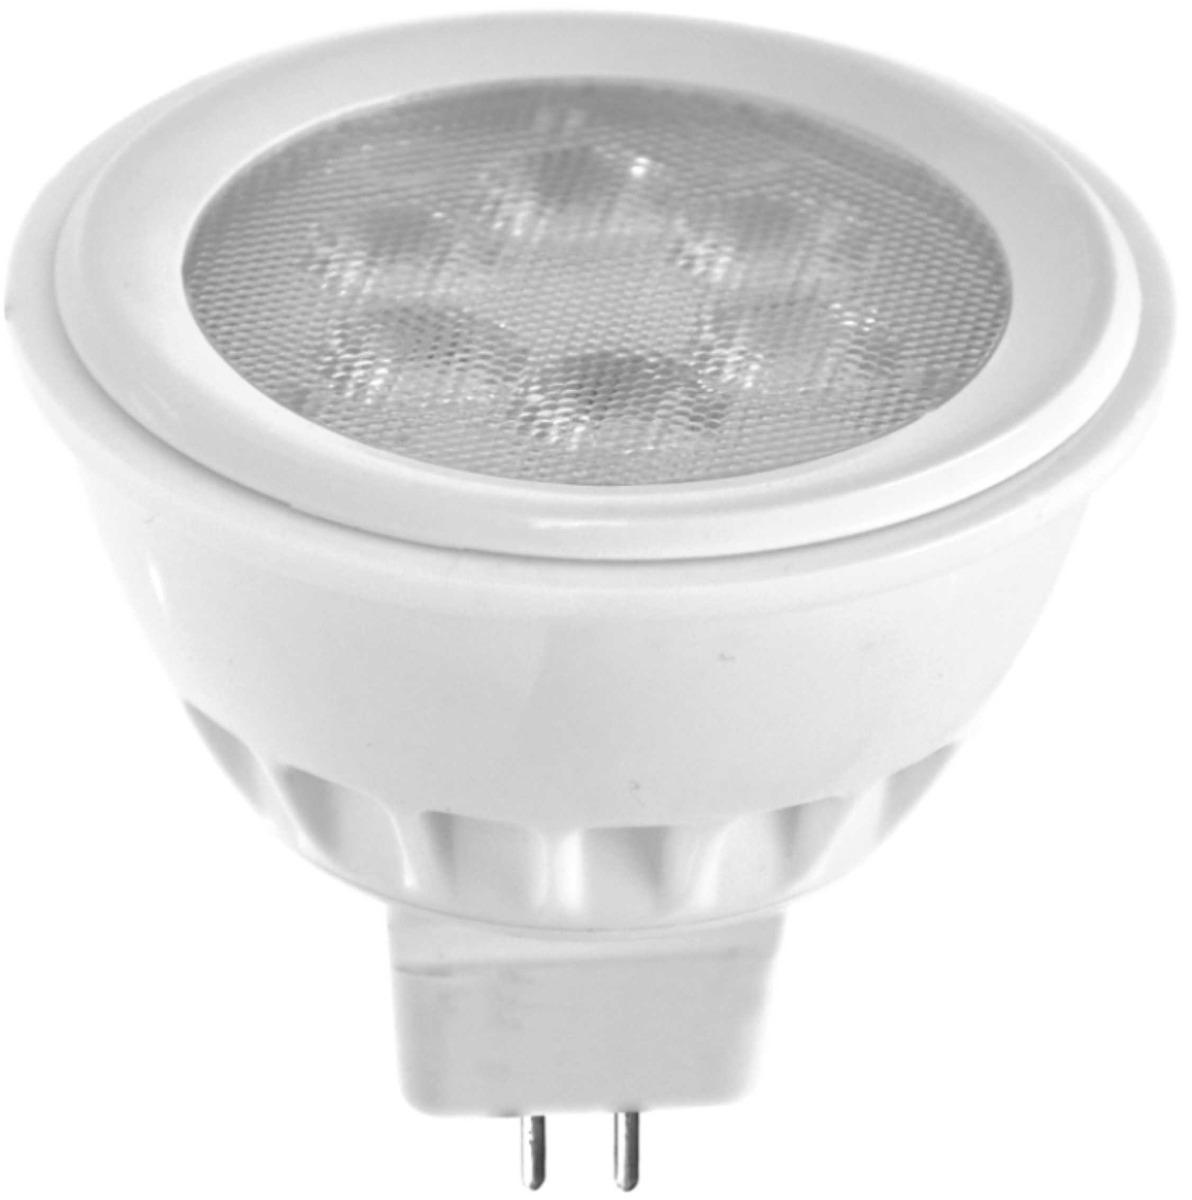 20 lampadas led dicroica mr16 3w 12v branco frio luz for Lampada led